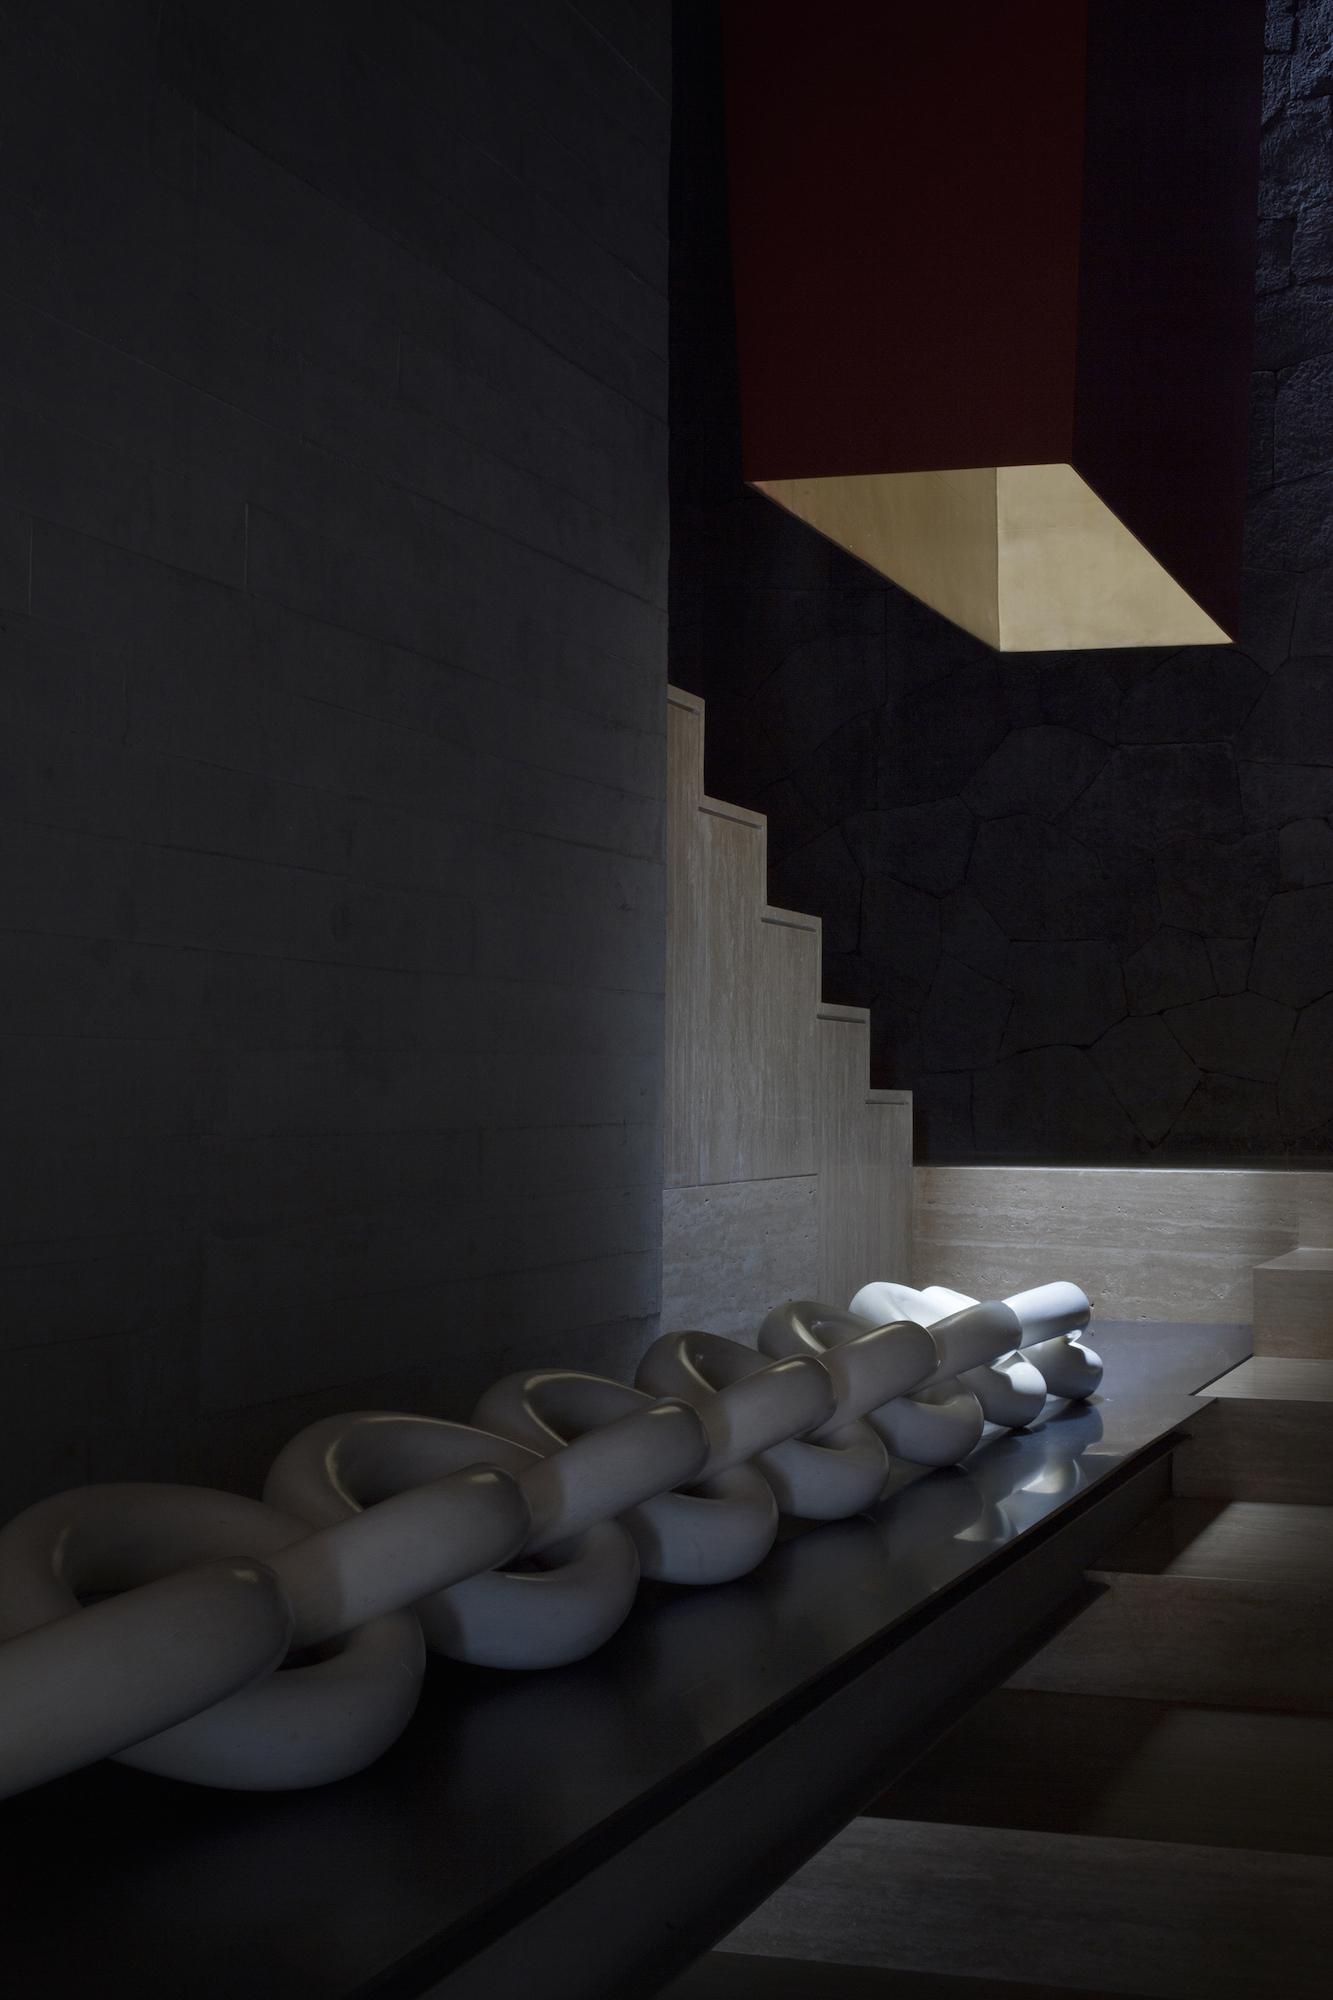 530eb4dbc07a80ce8b00011a_house-maza-chk-arquitectura_2014_02_18_mz_fotos_yoshihiro_2280px_ancho_-10-